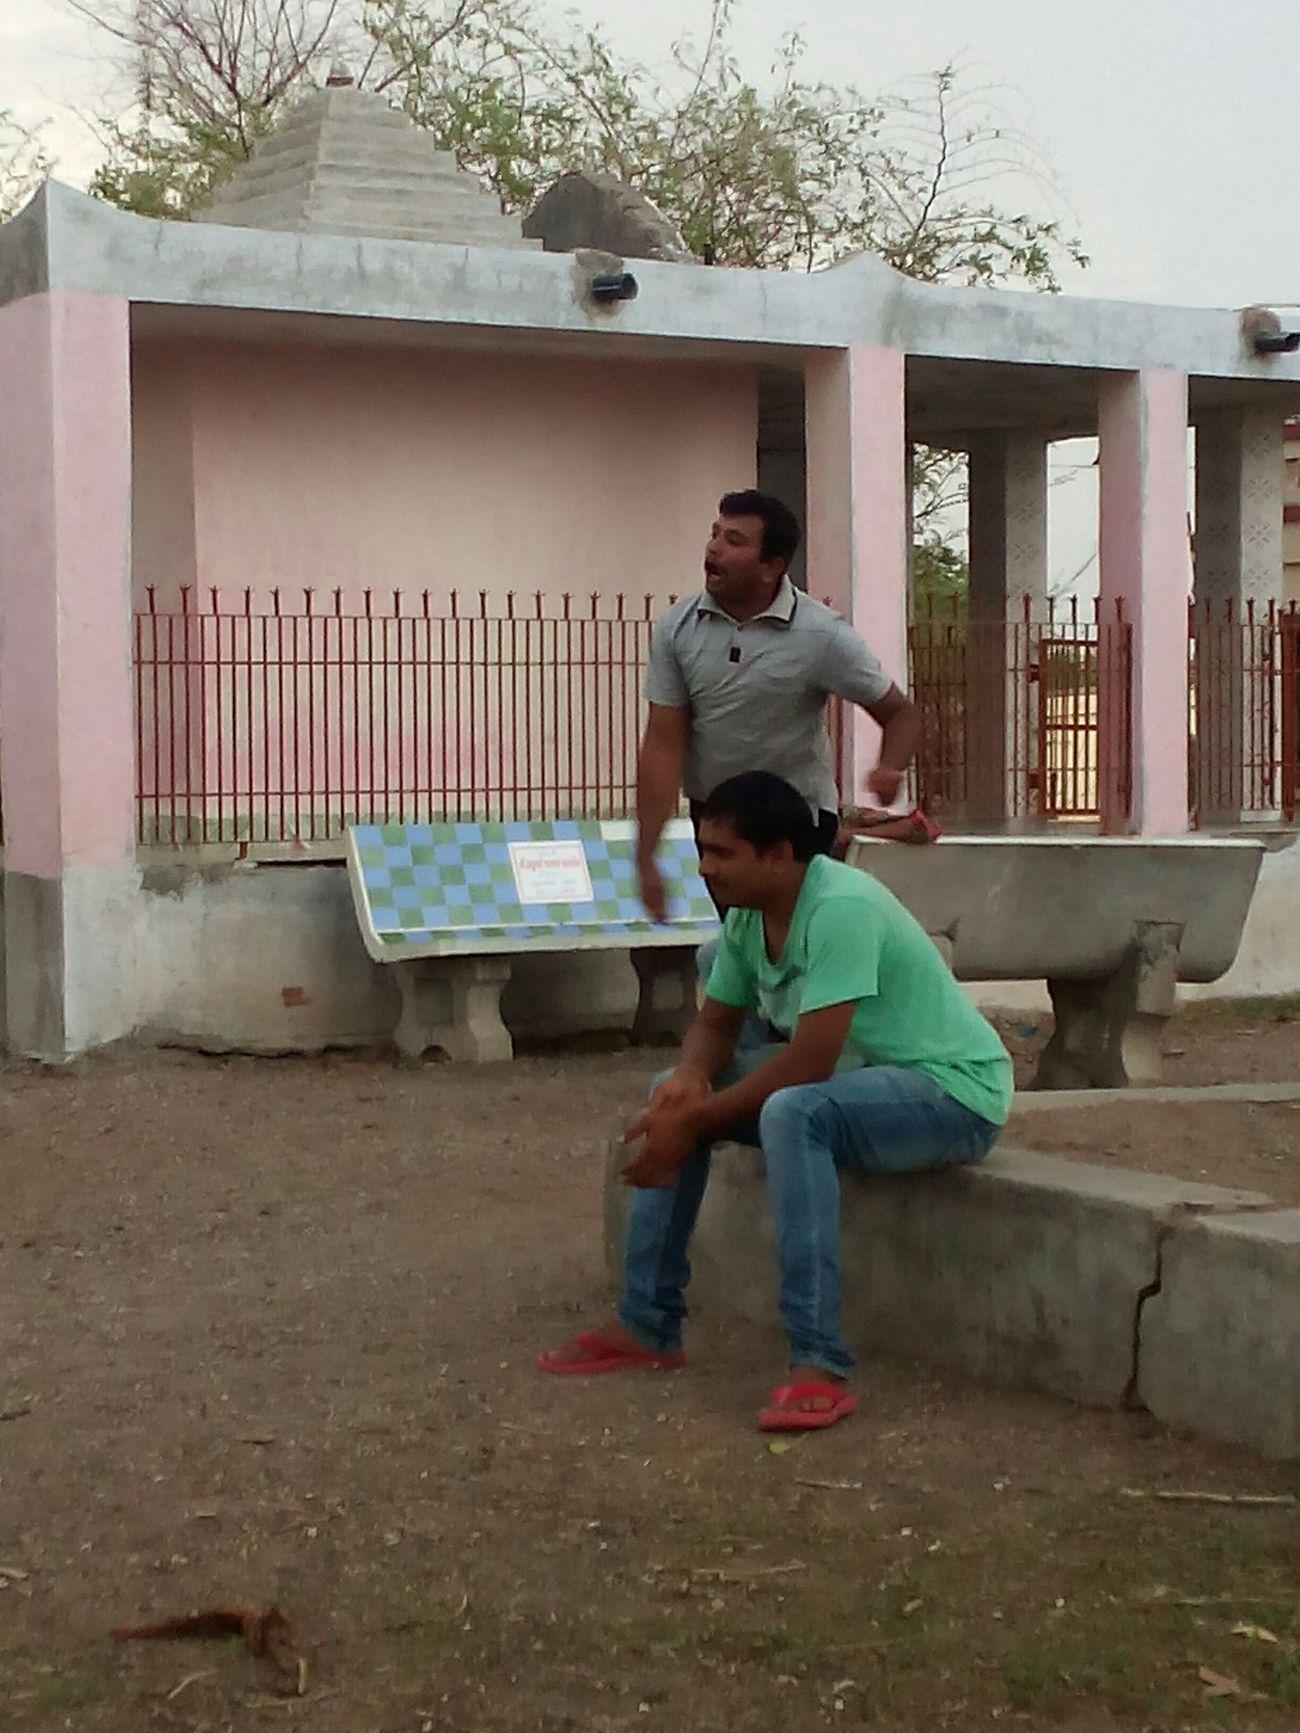 Friends Jamnagar Gujarat India The Amazing Human Body Crickets